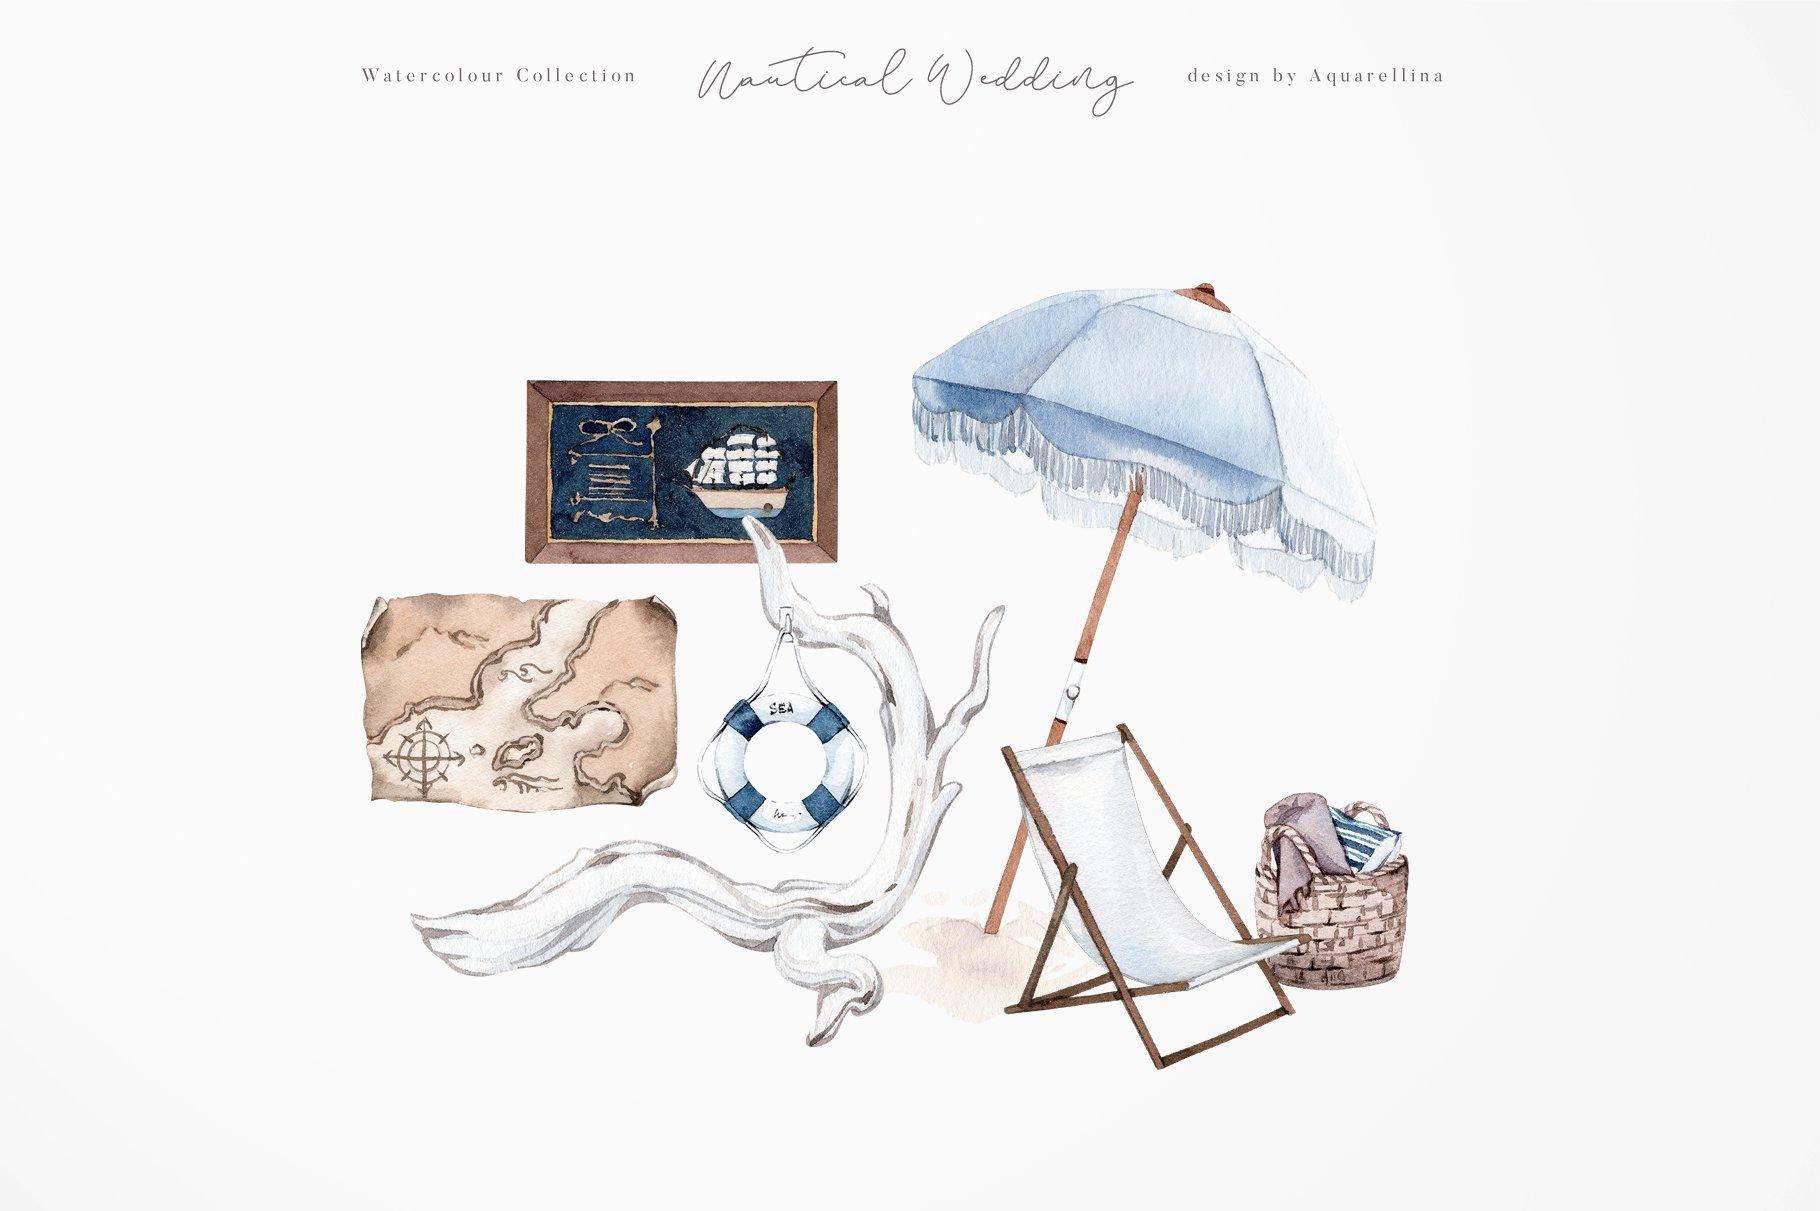 nautical beach wedding illustrations by aquarellina screenshot 17 18